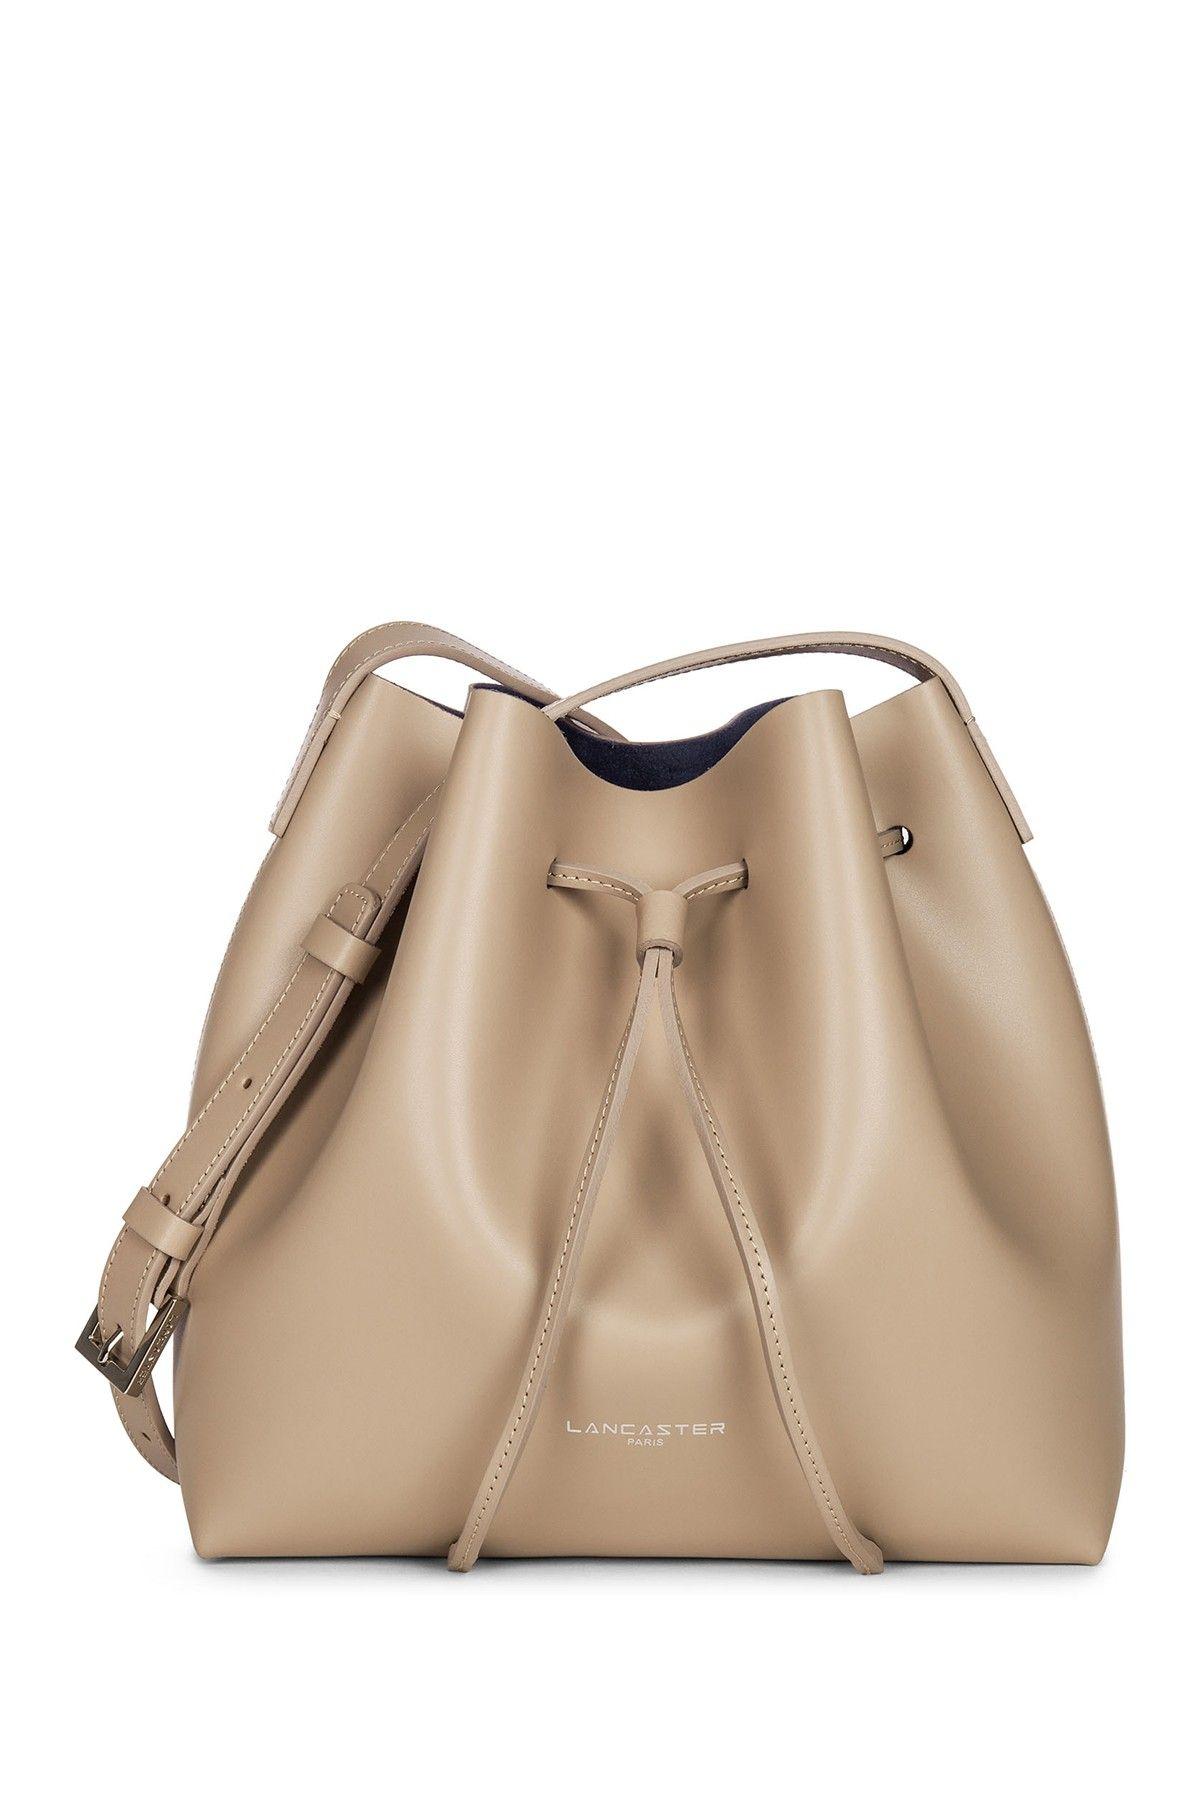 3f3a1eb86973 Lancaster Paris Matte Smooth Leather Bucket Bag